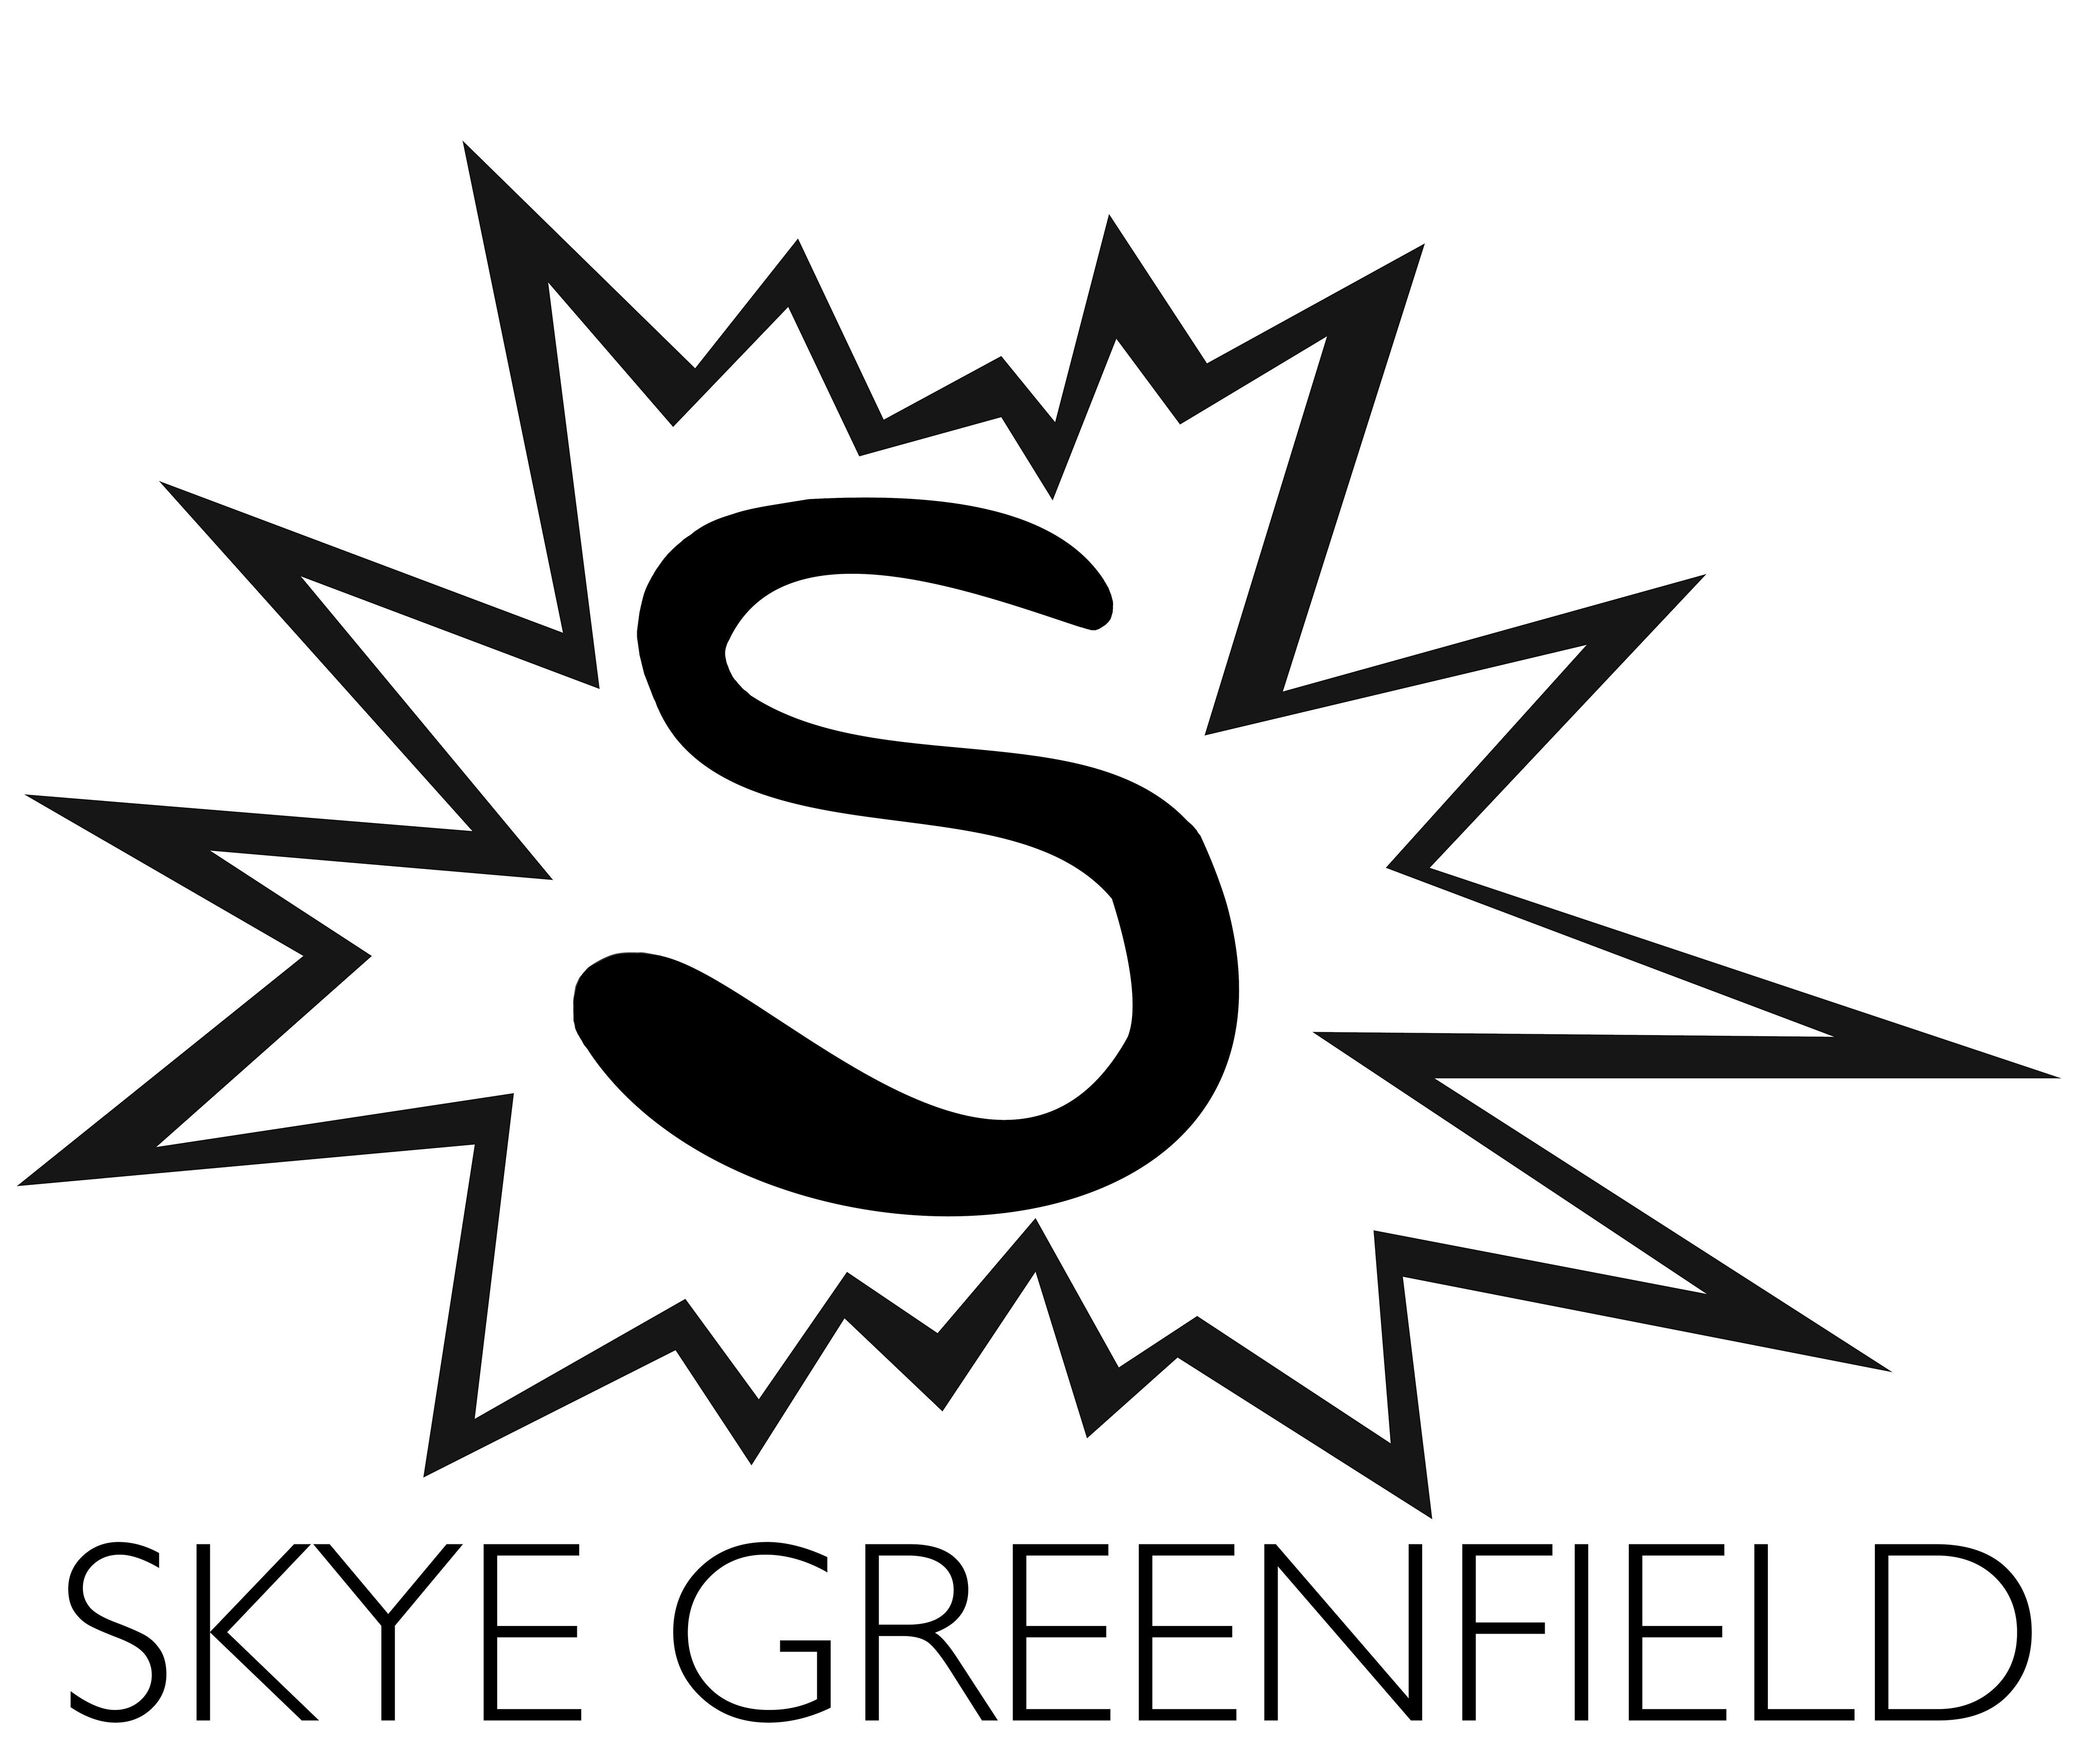 Skye Greenfield